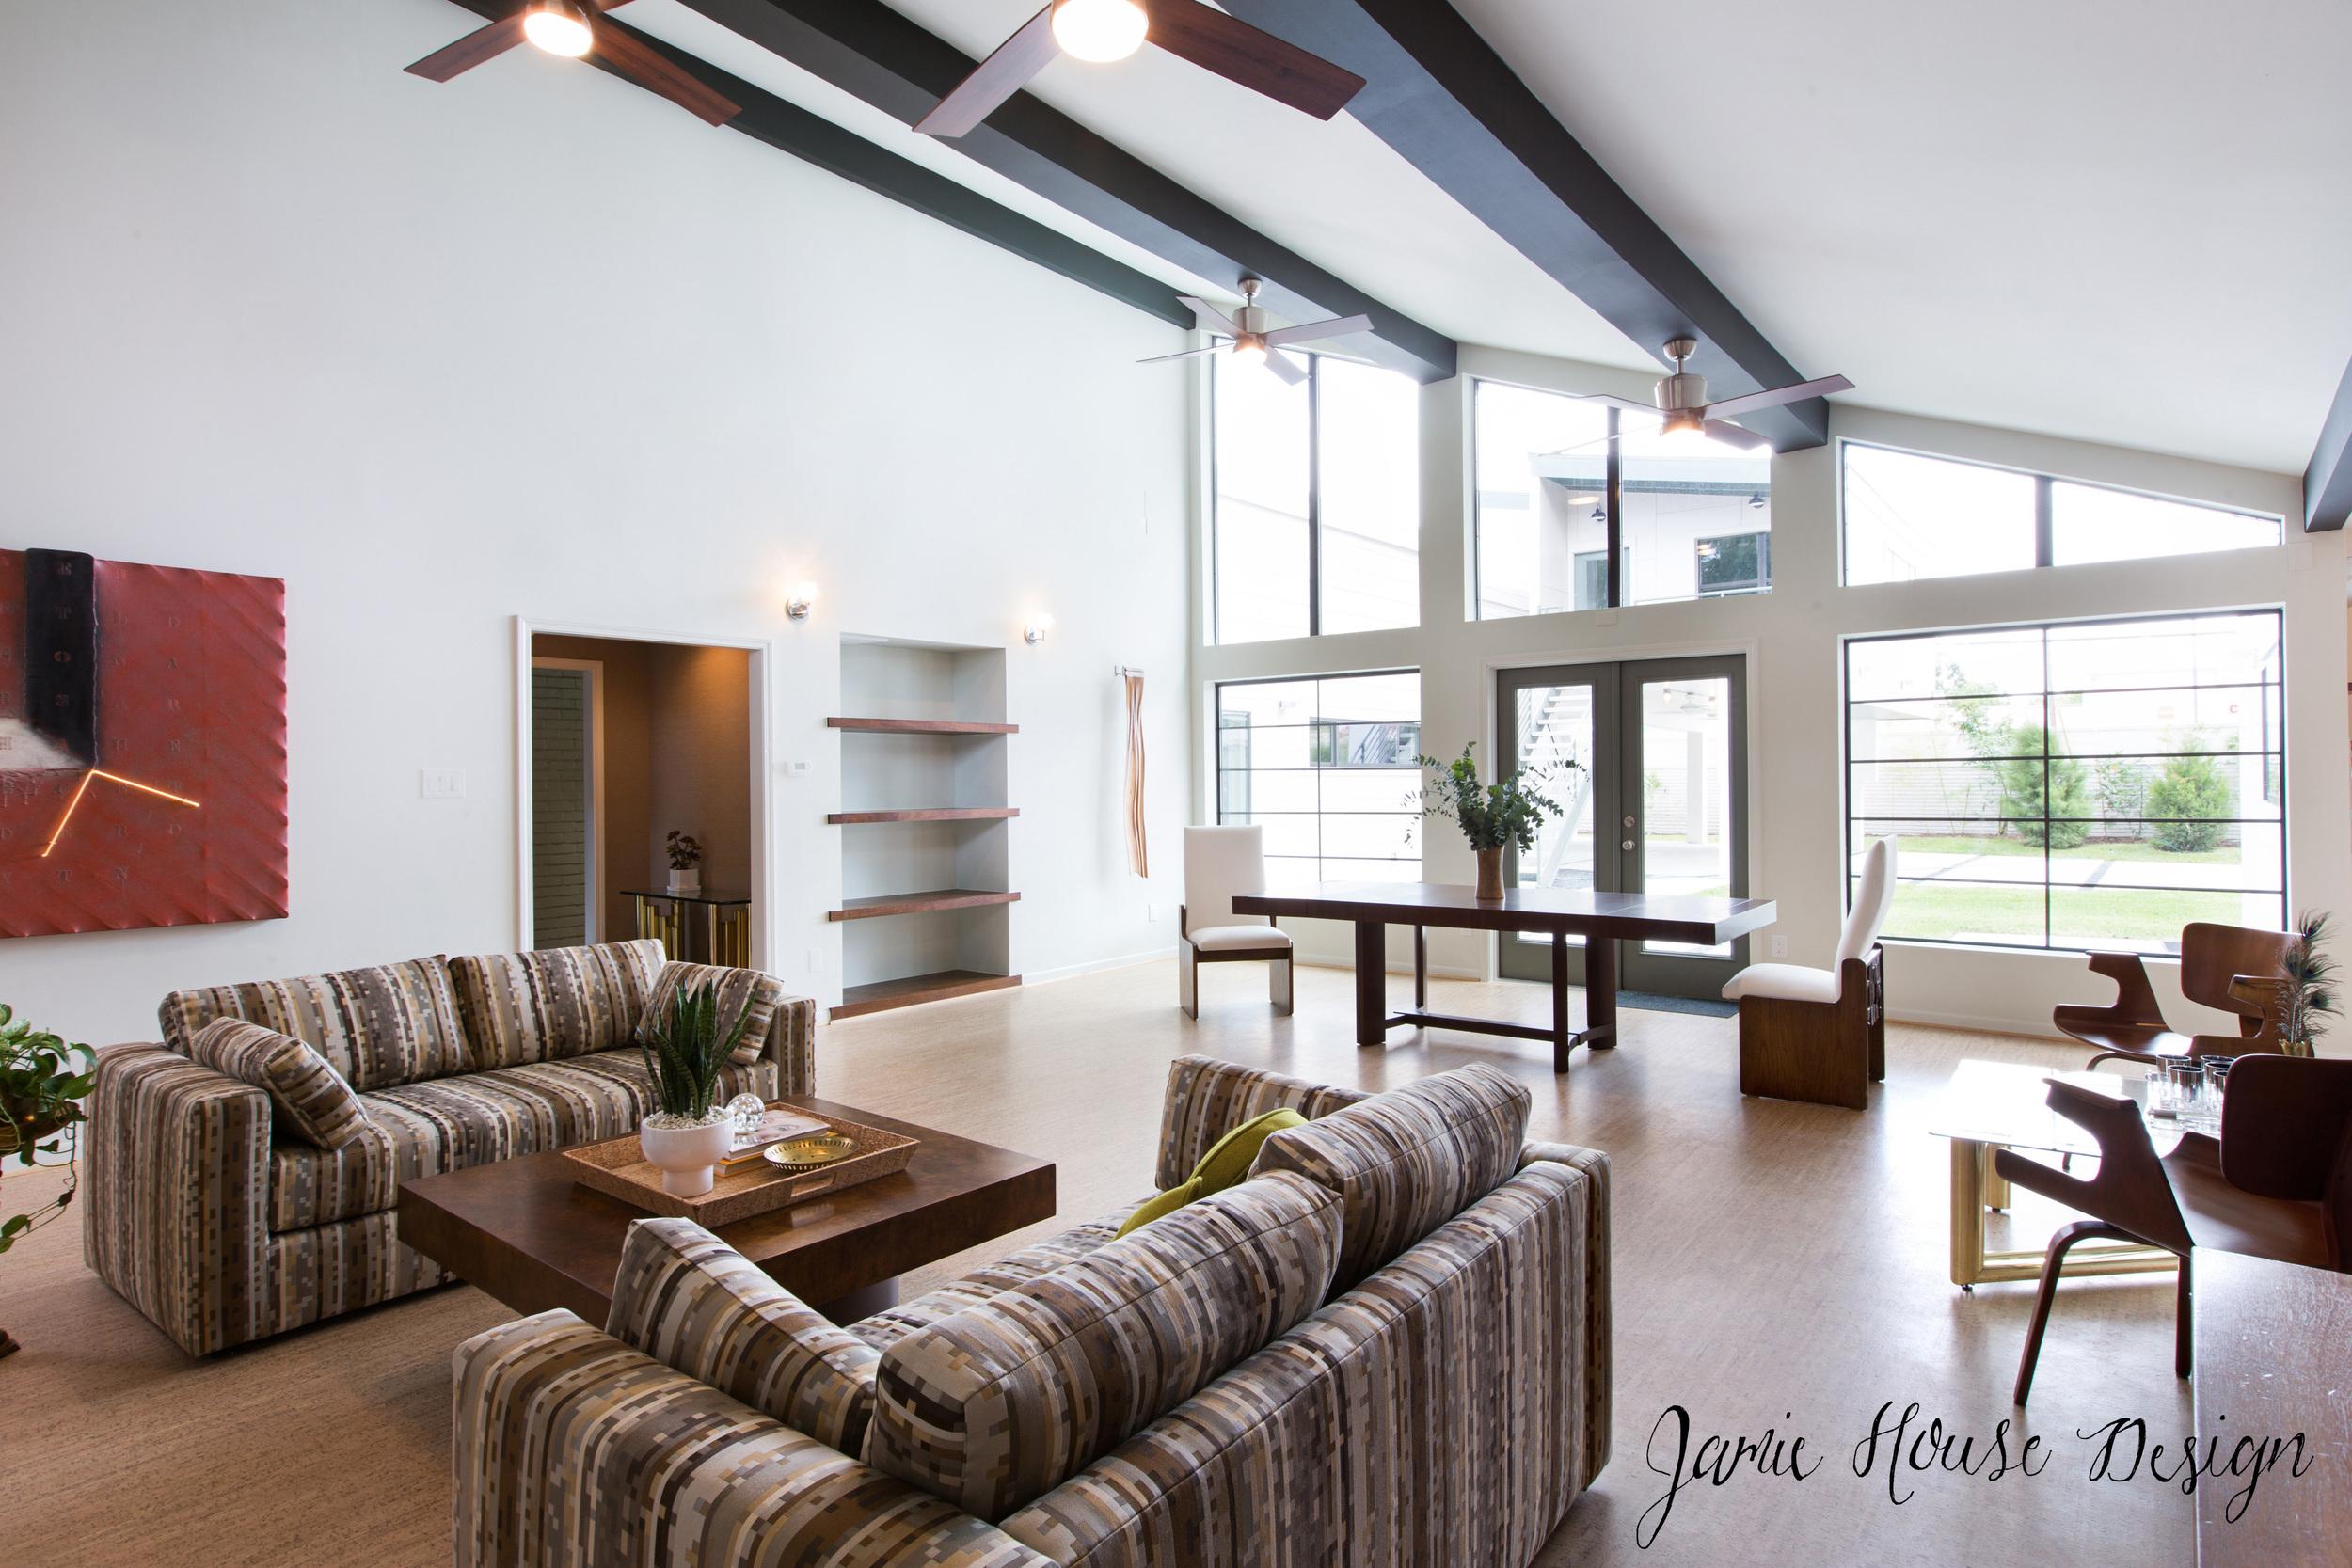 Jamie House Design